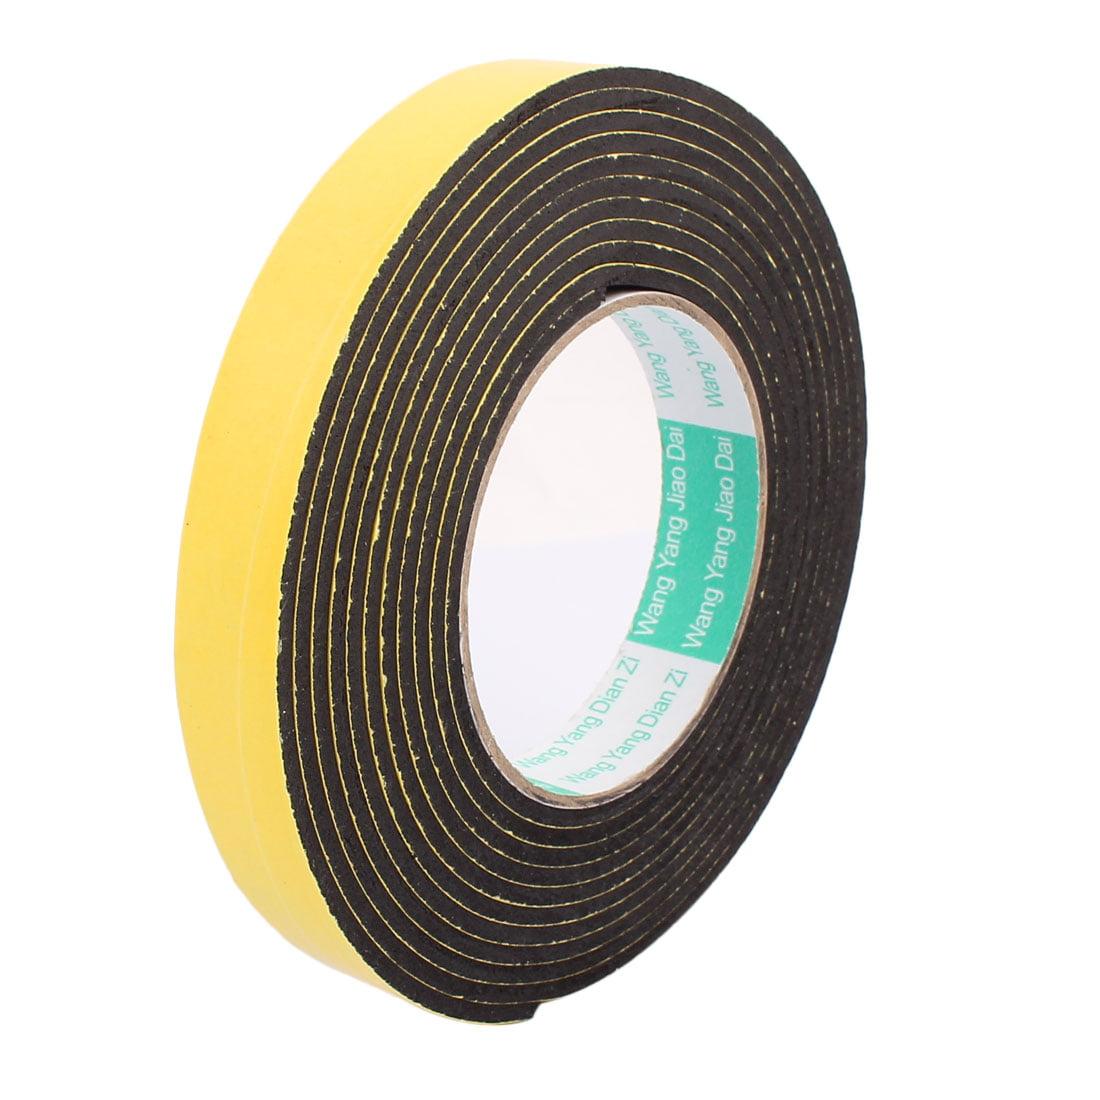 Single Side Shockproof Foam Tape Adhesive Sponge Tape 20mm Wide x 4M Length